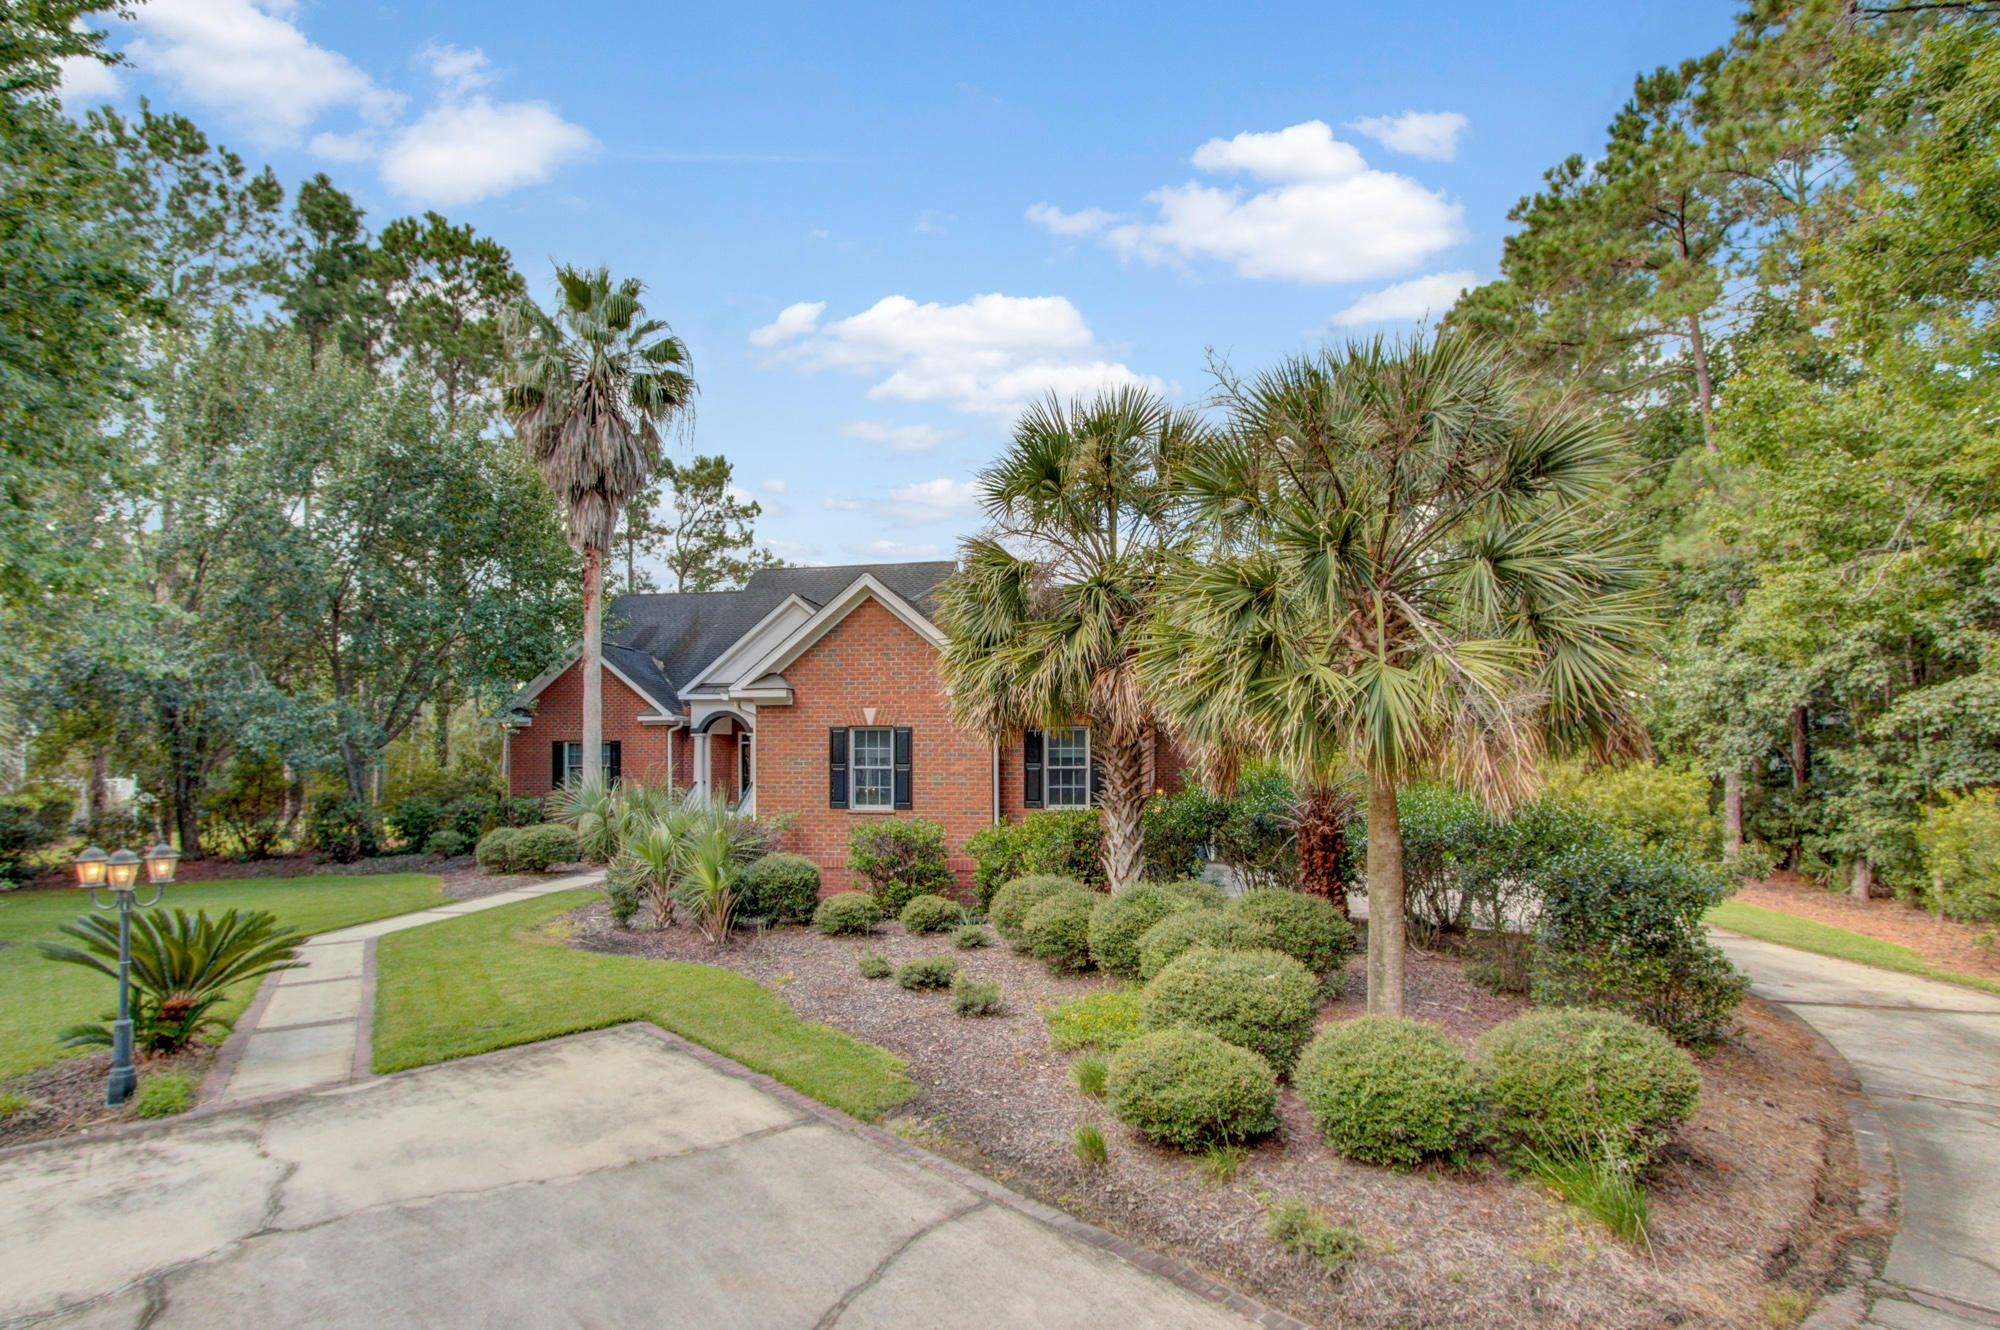 Dunes West Homes For Sale - 3136 Pignatelli, Mount Pleasant, SC - 9